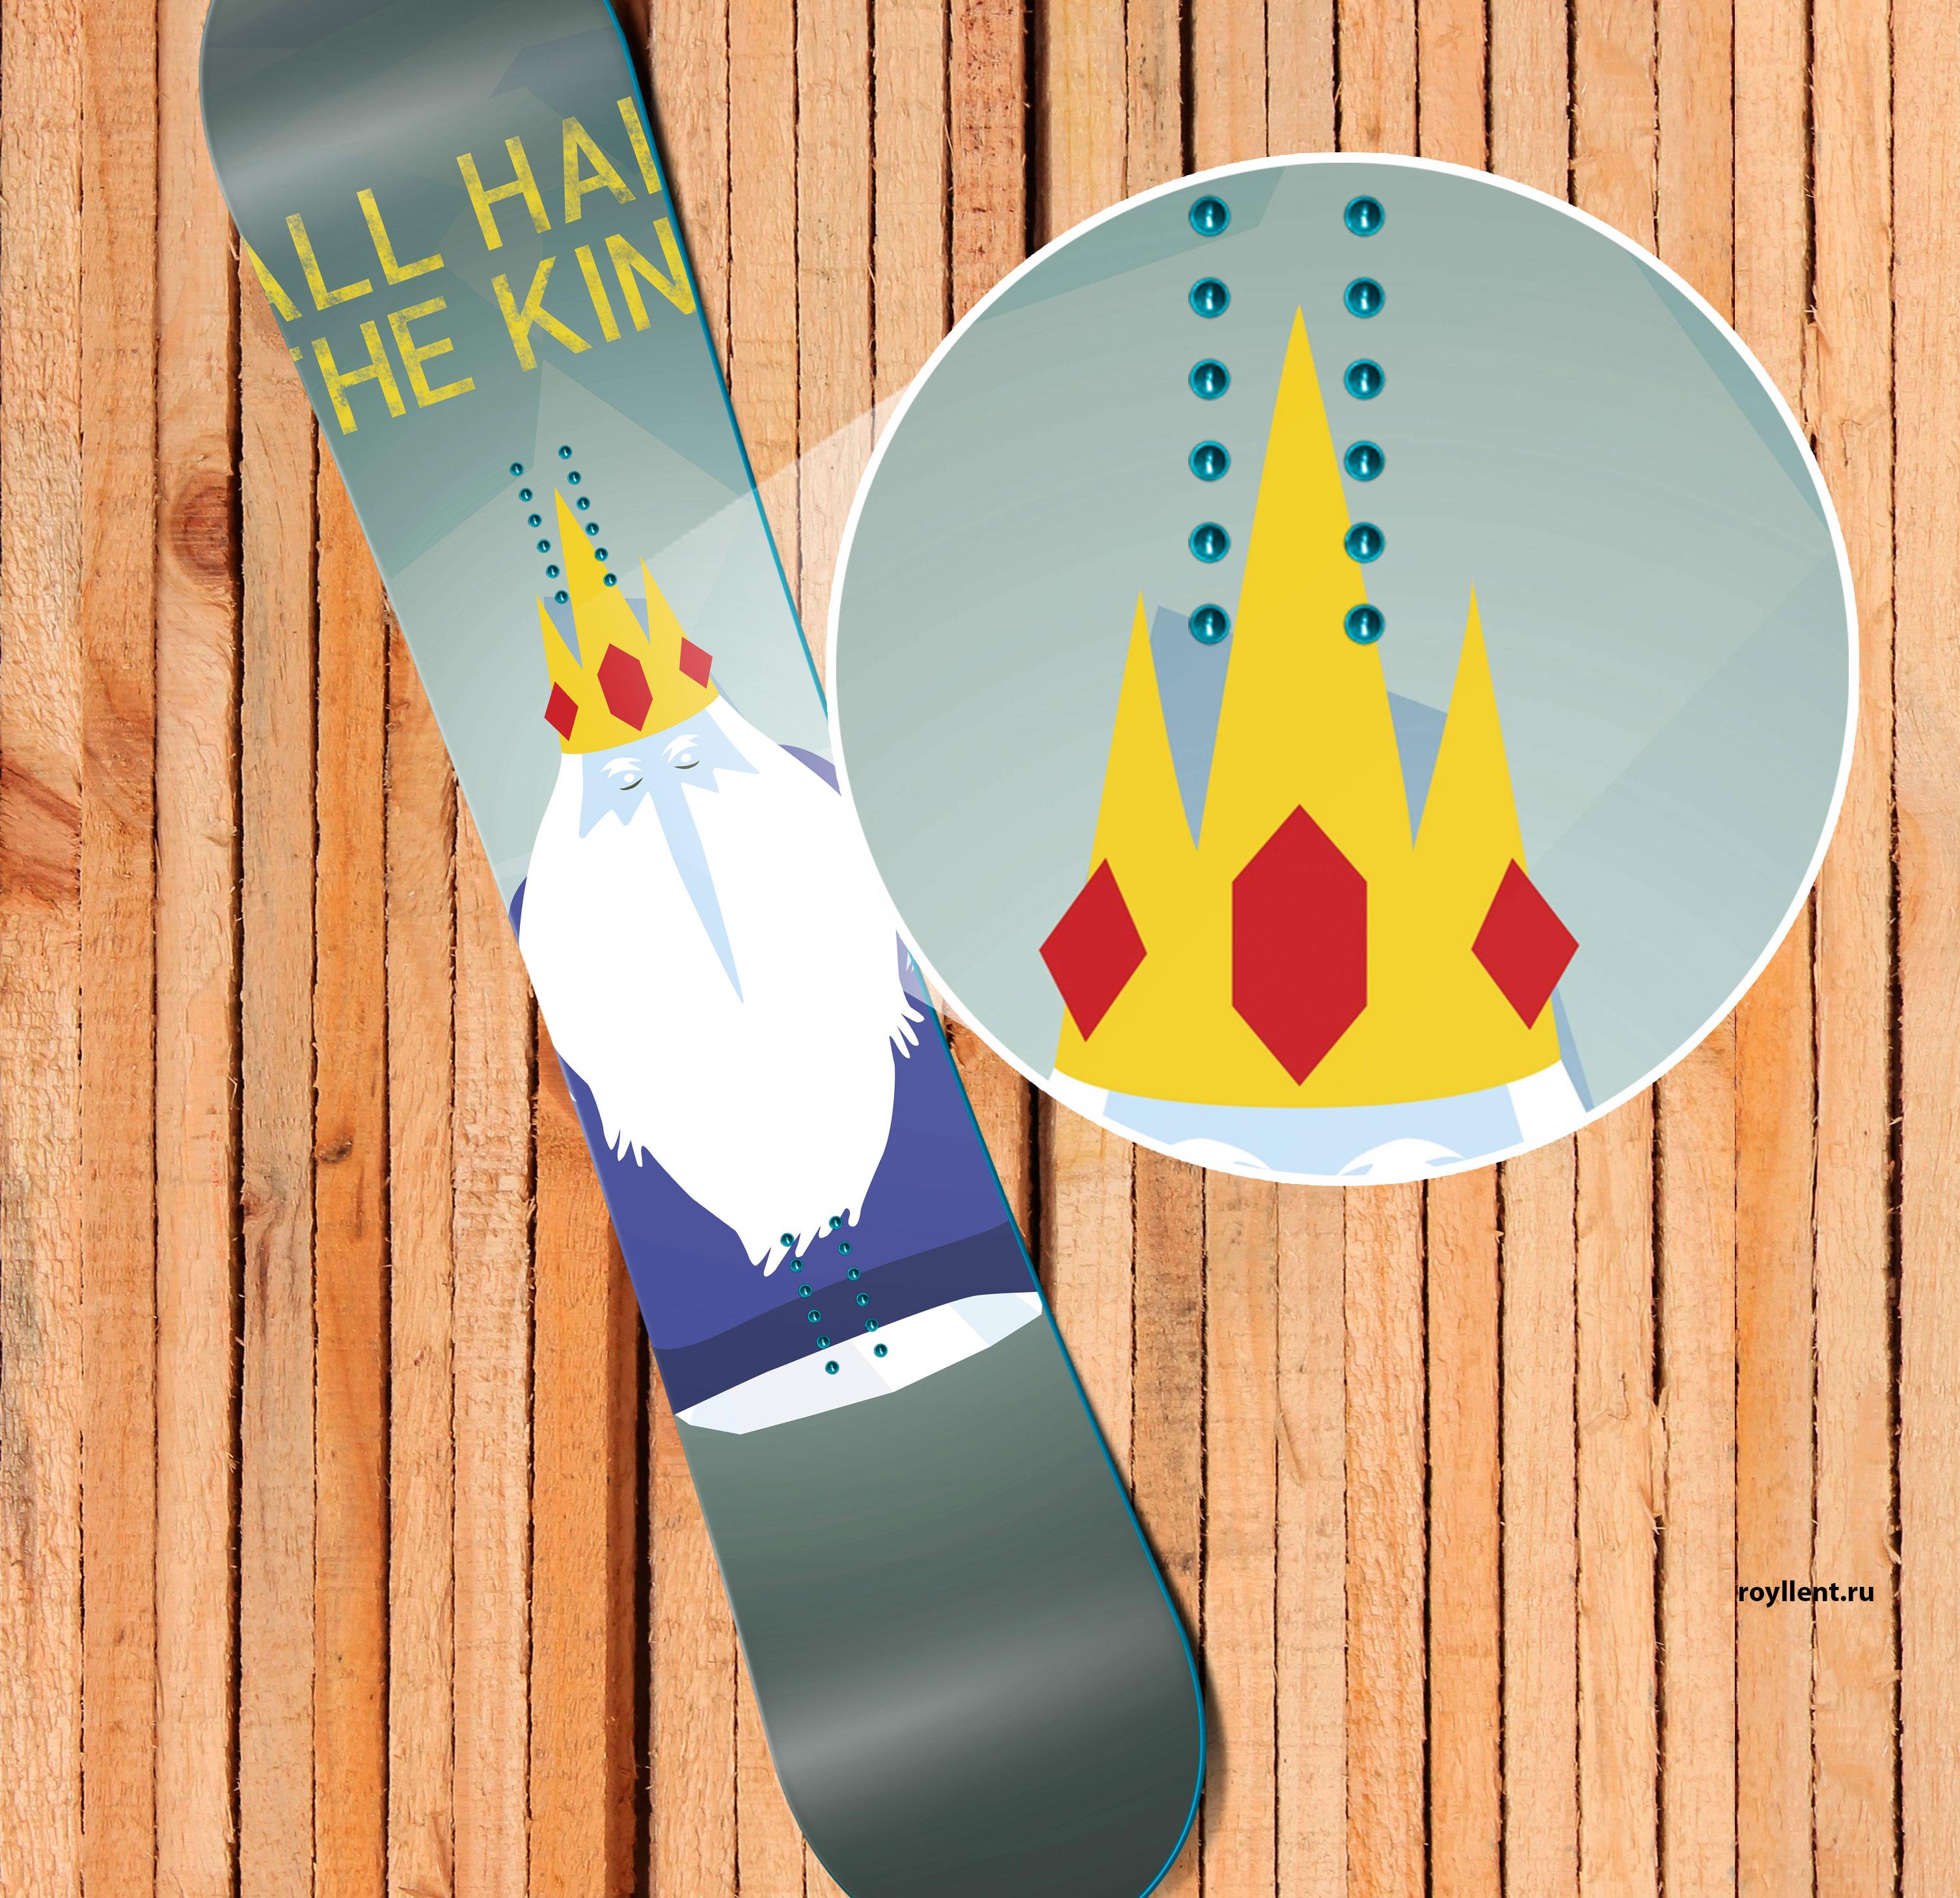 ice_king cnowboard design sale skin wrap 2016